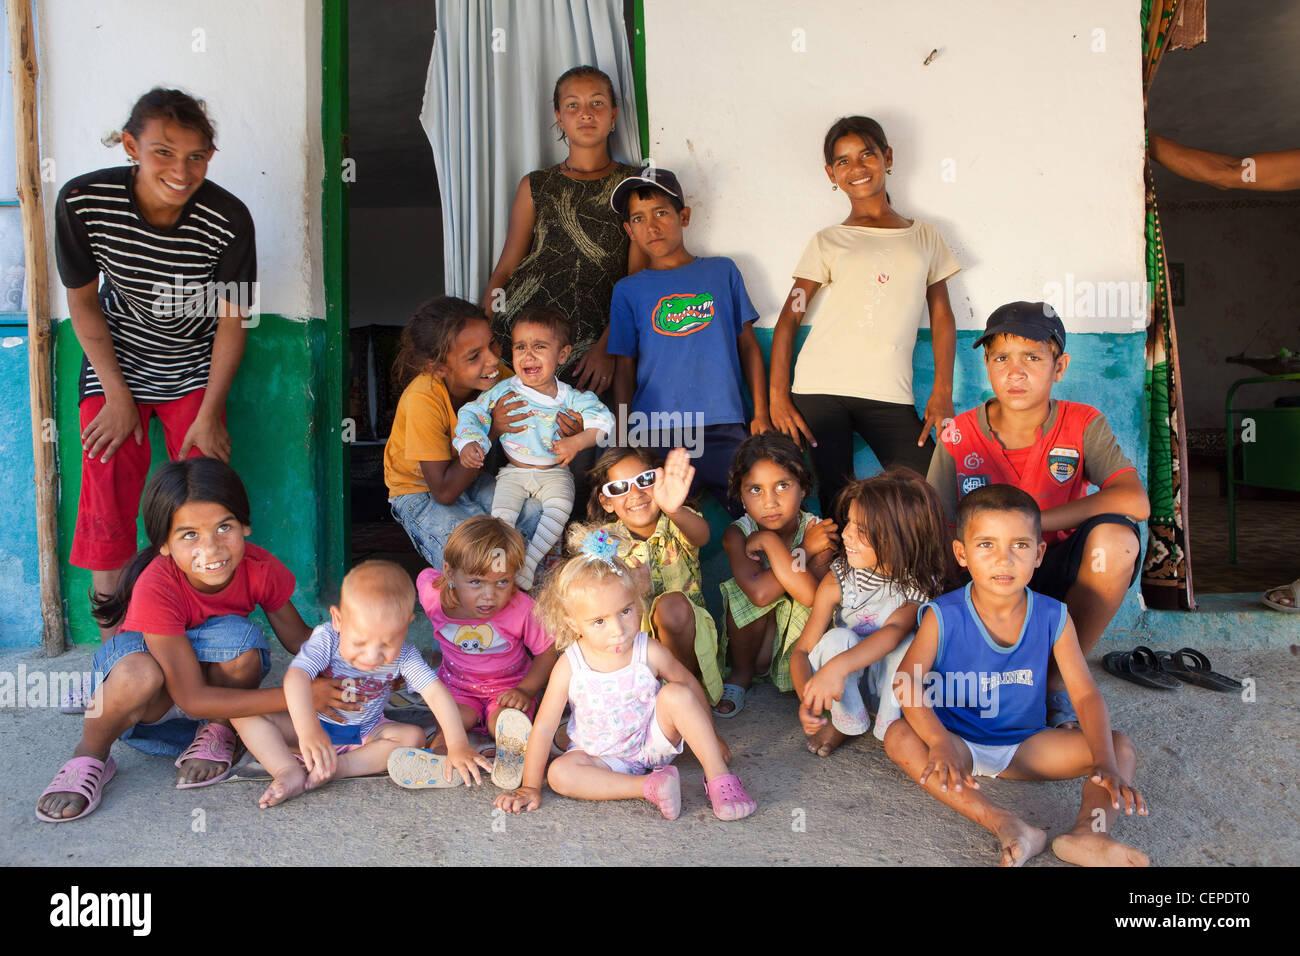 Roma gypsy family posing in Bulgaria - Stock Image